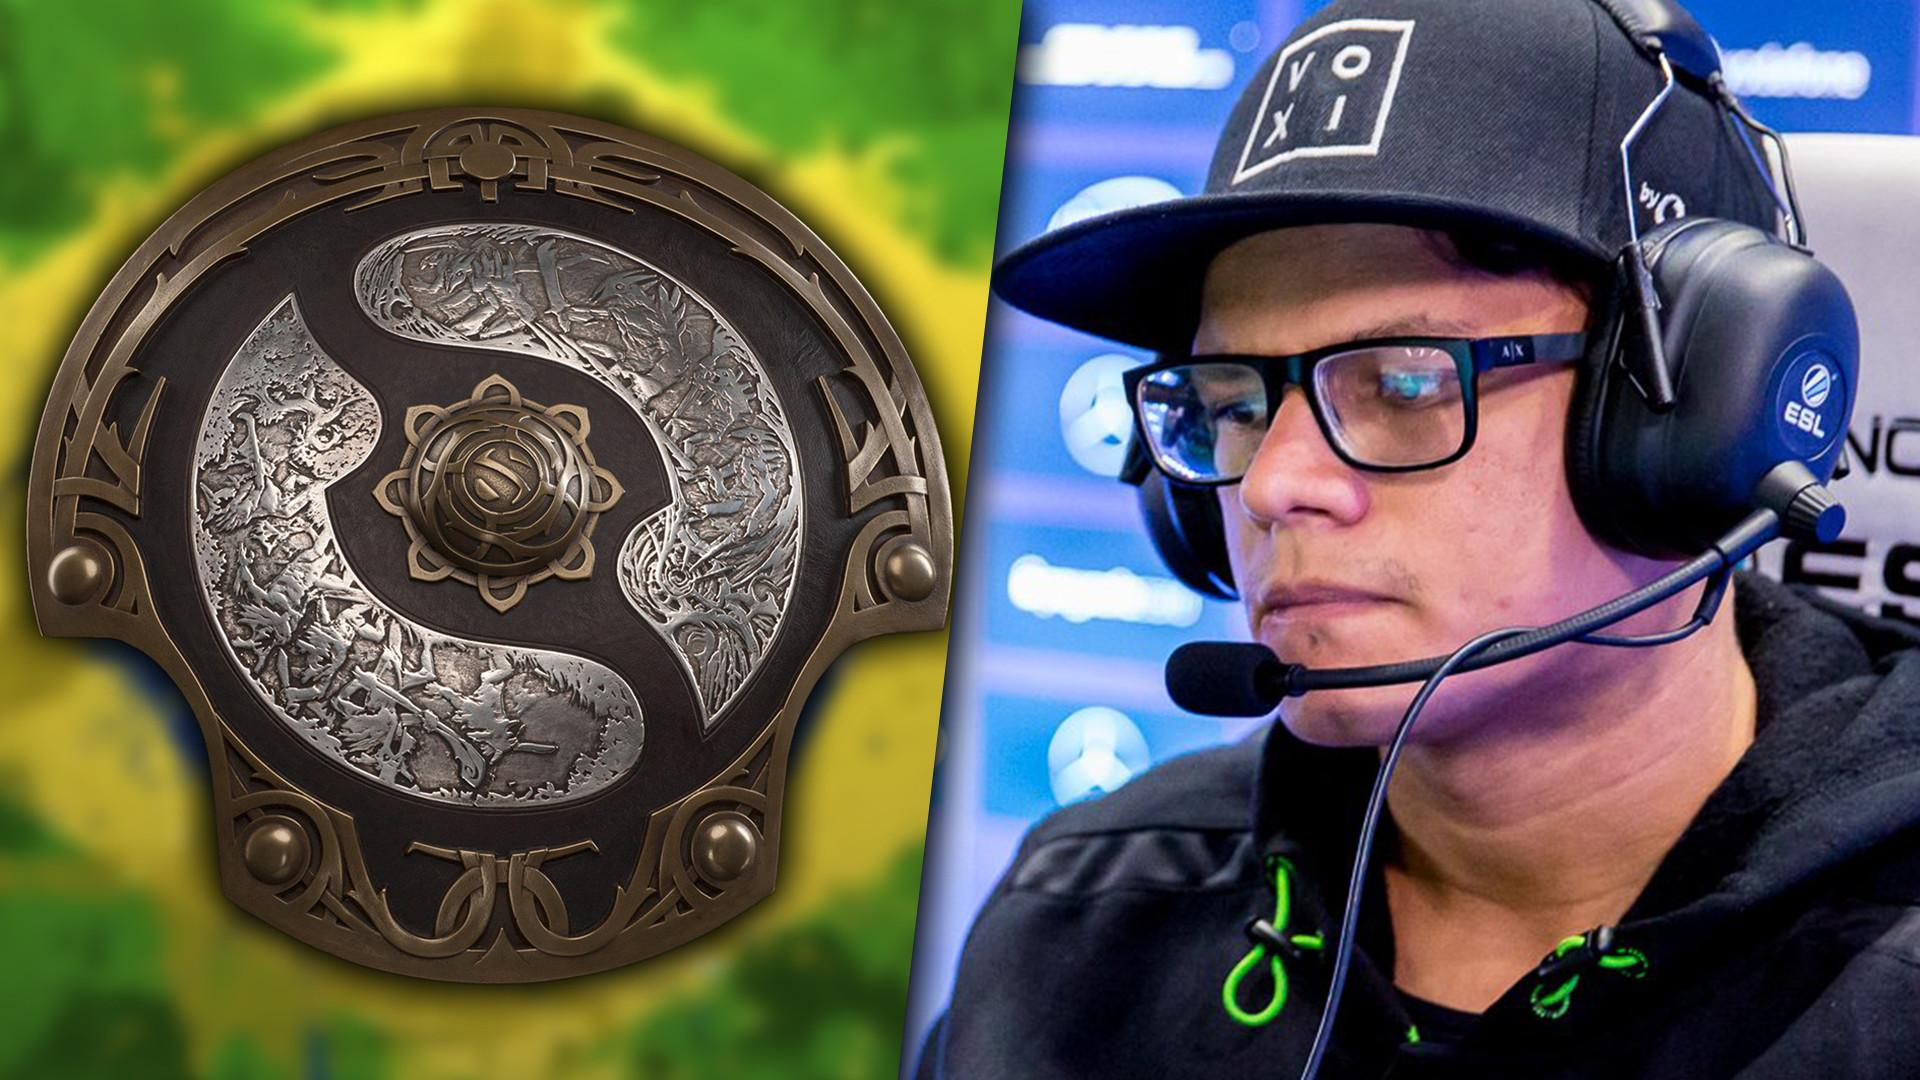 The International brasileiros hFn